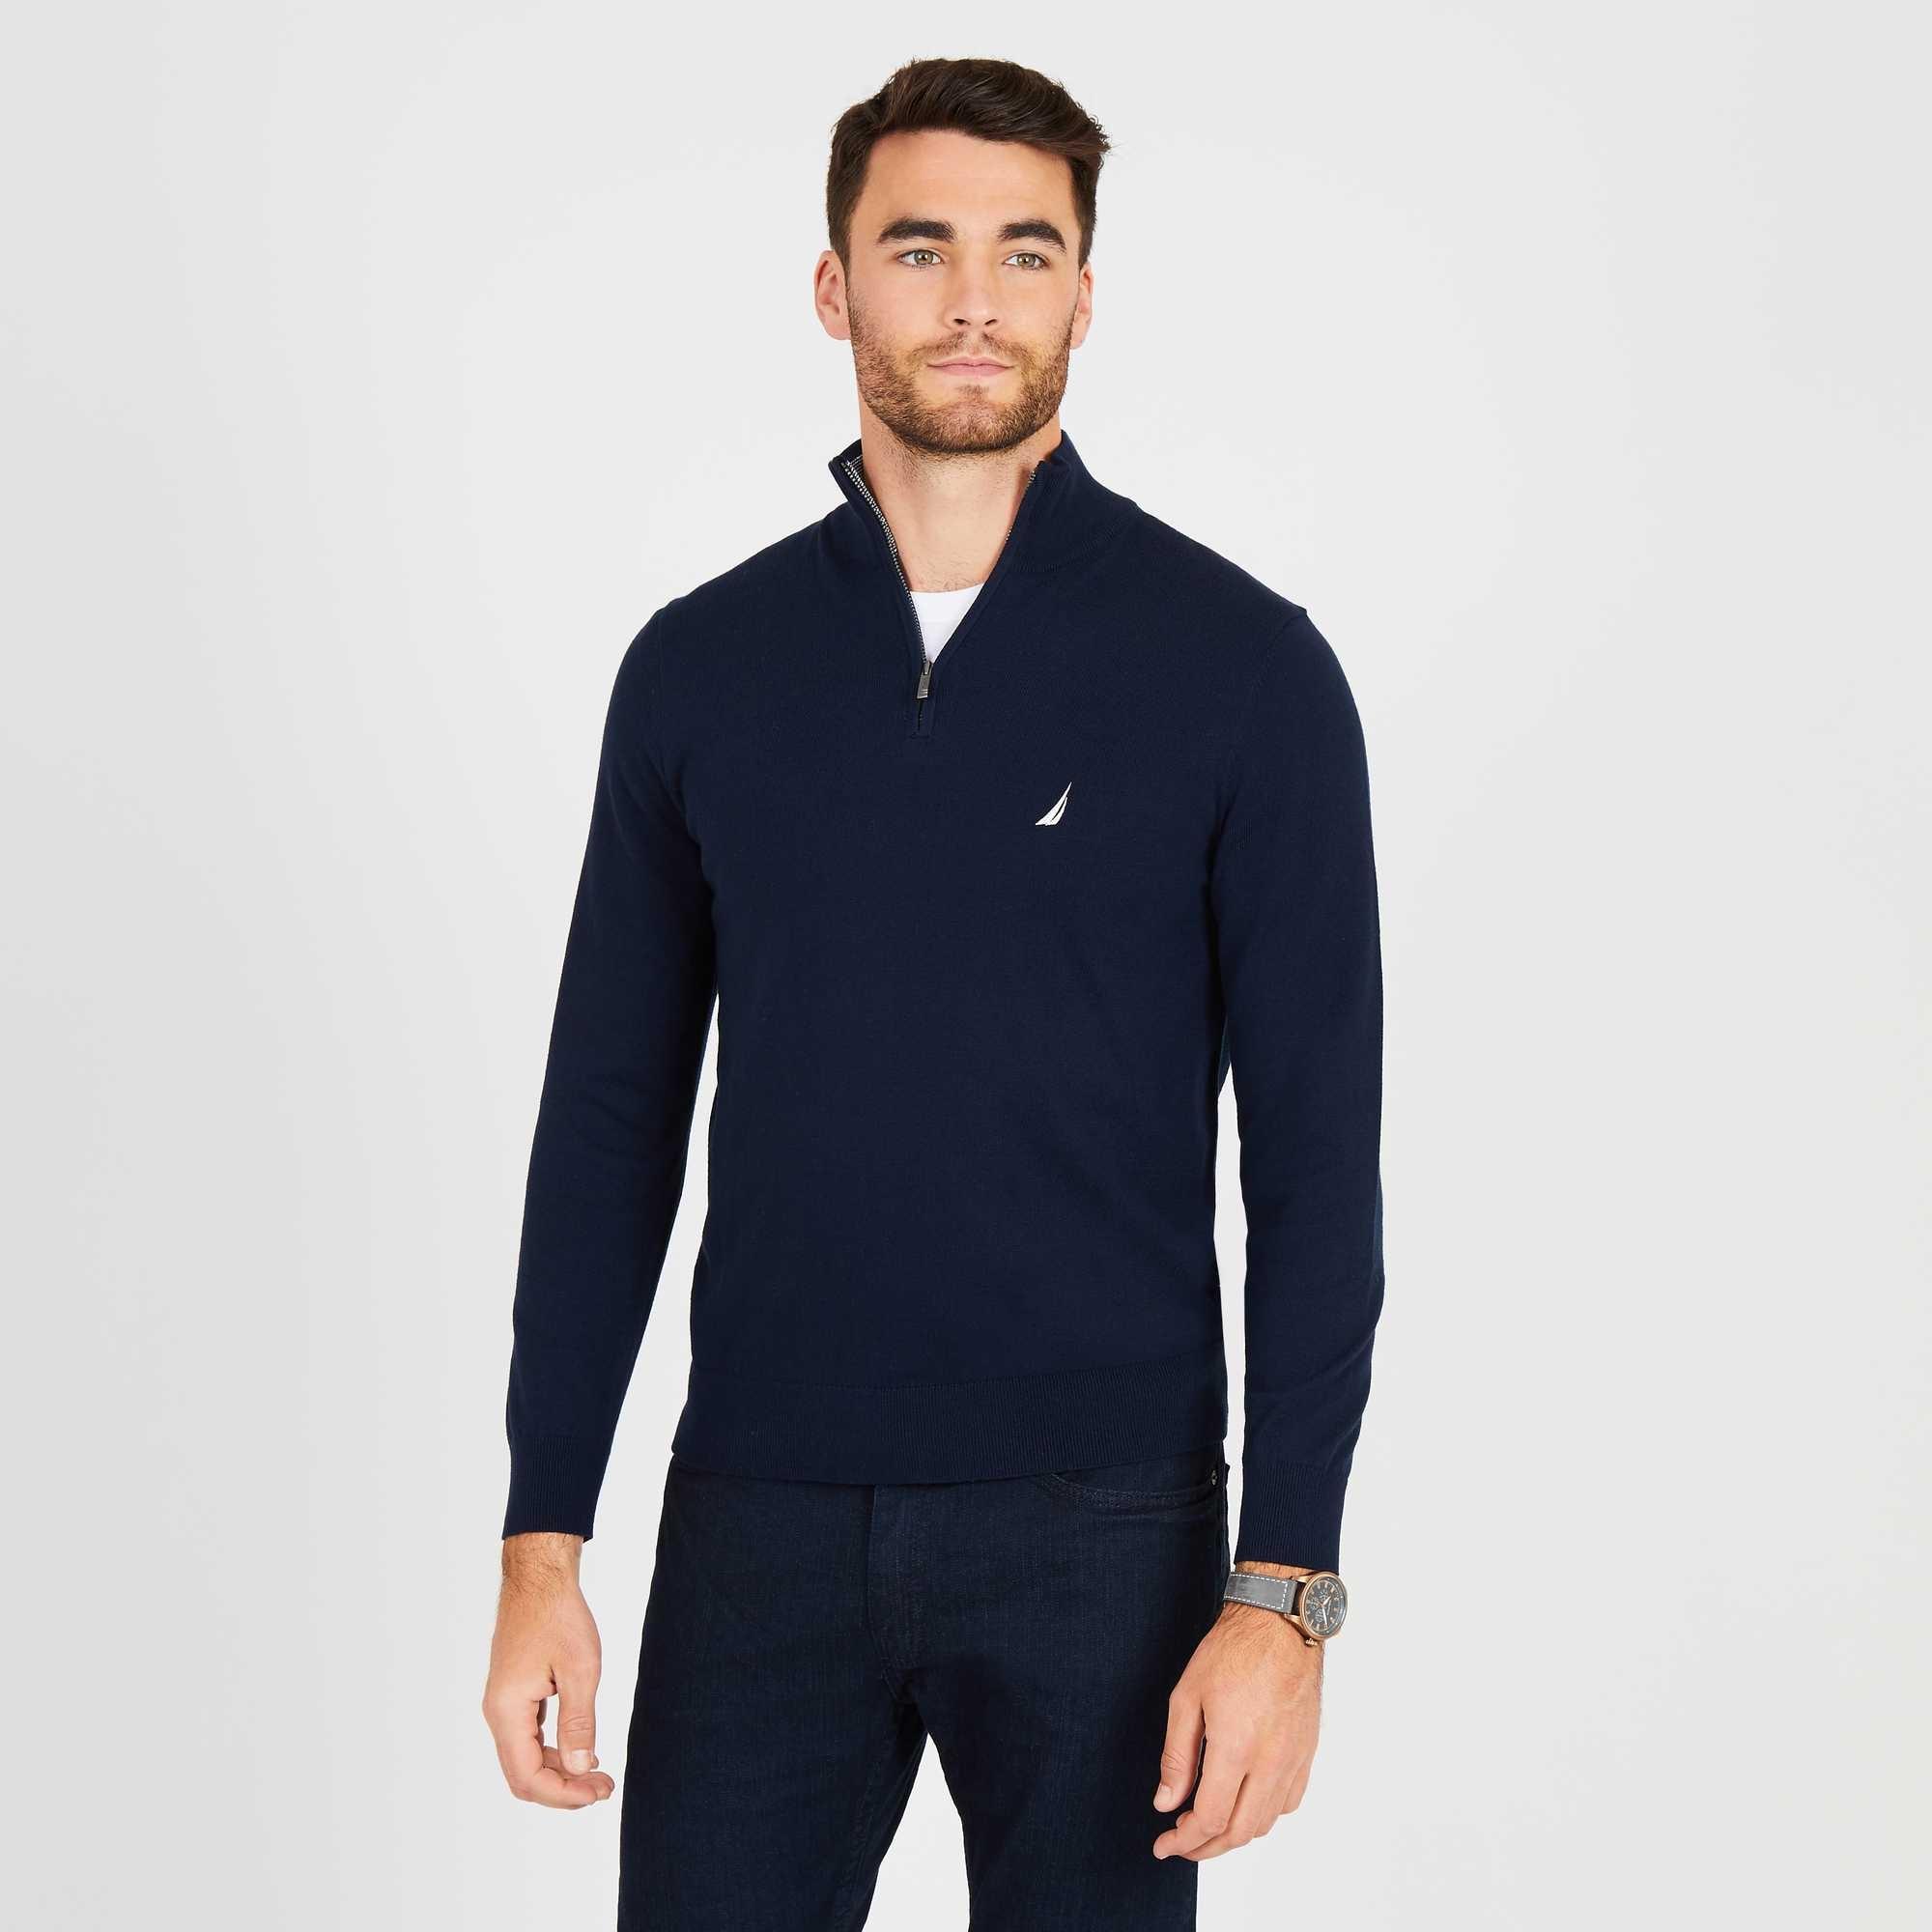 Nautica Jersey Men With Zipper Length Chest Logo Cotton Navy Blue S83104.4NV